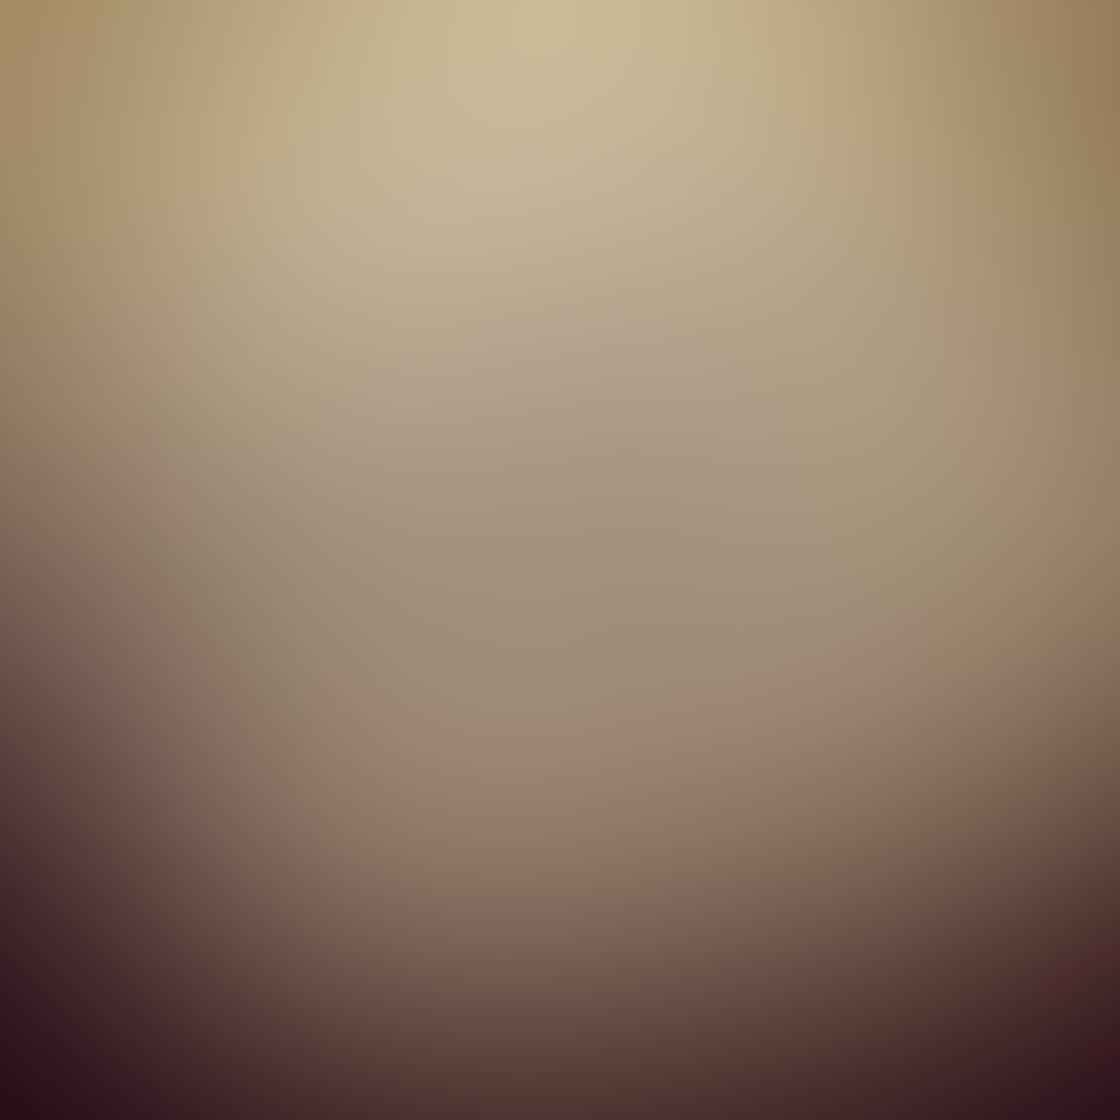 iPhone Reflection Photo 03